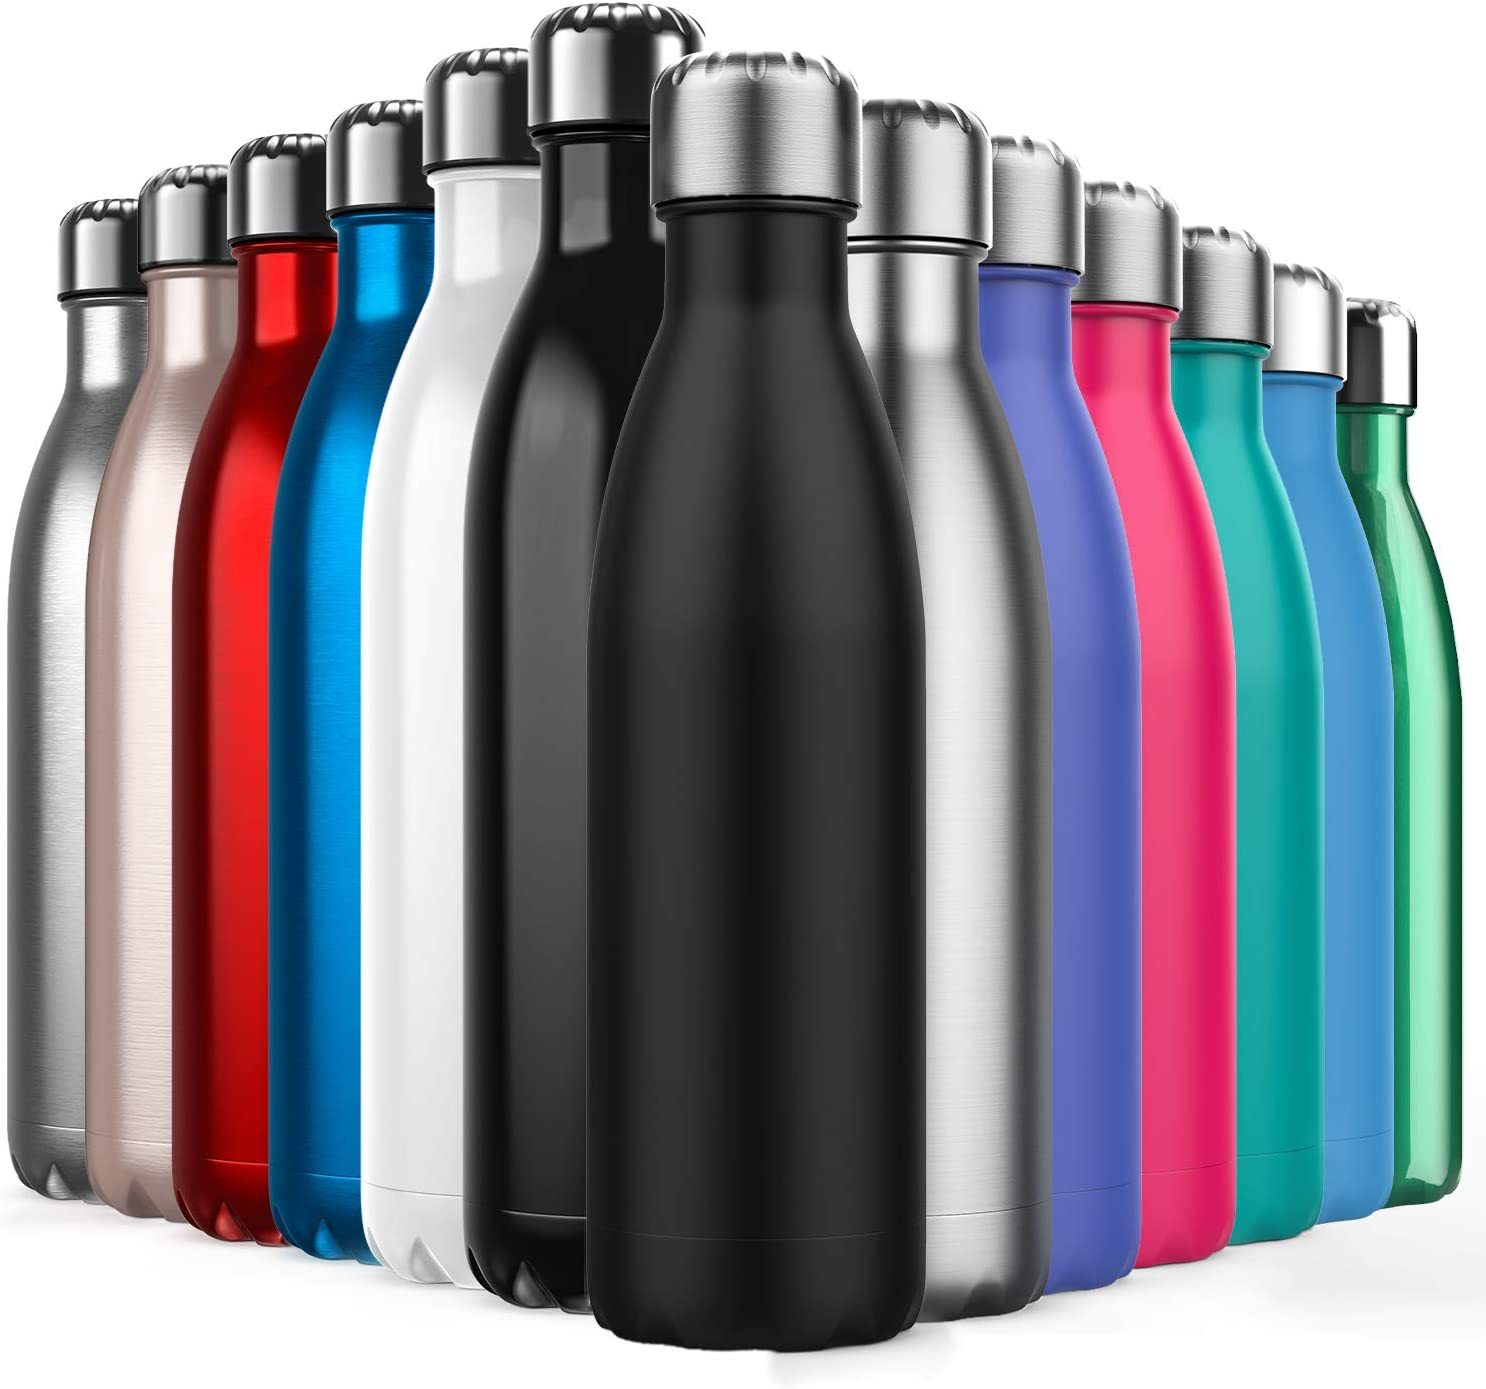 Invool Botella de Agua de Acero Inoxidable,Diseño de Pared Doble,Boca EstáNdar,para Correr,Gimnasio,Yoga,Ciclismo,500ML,Negro